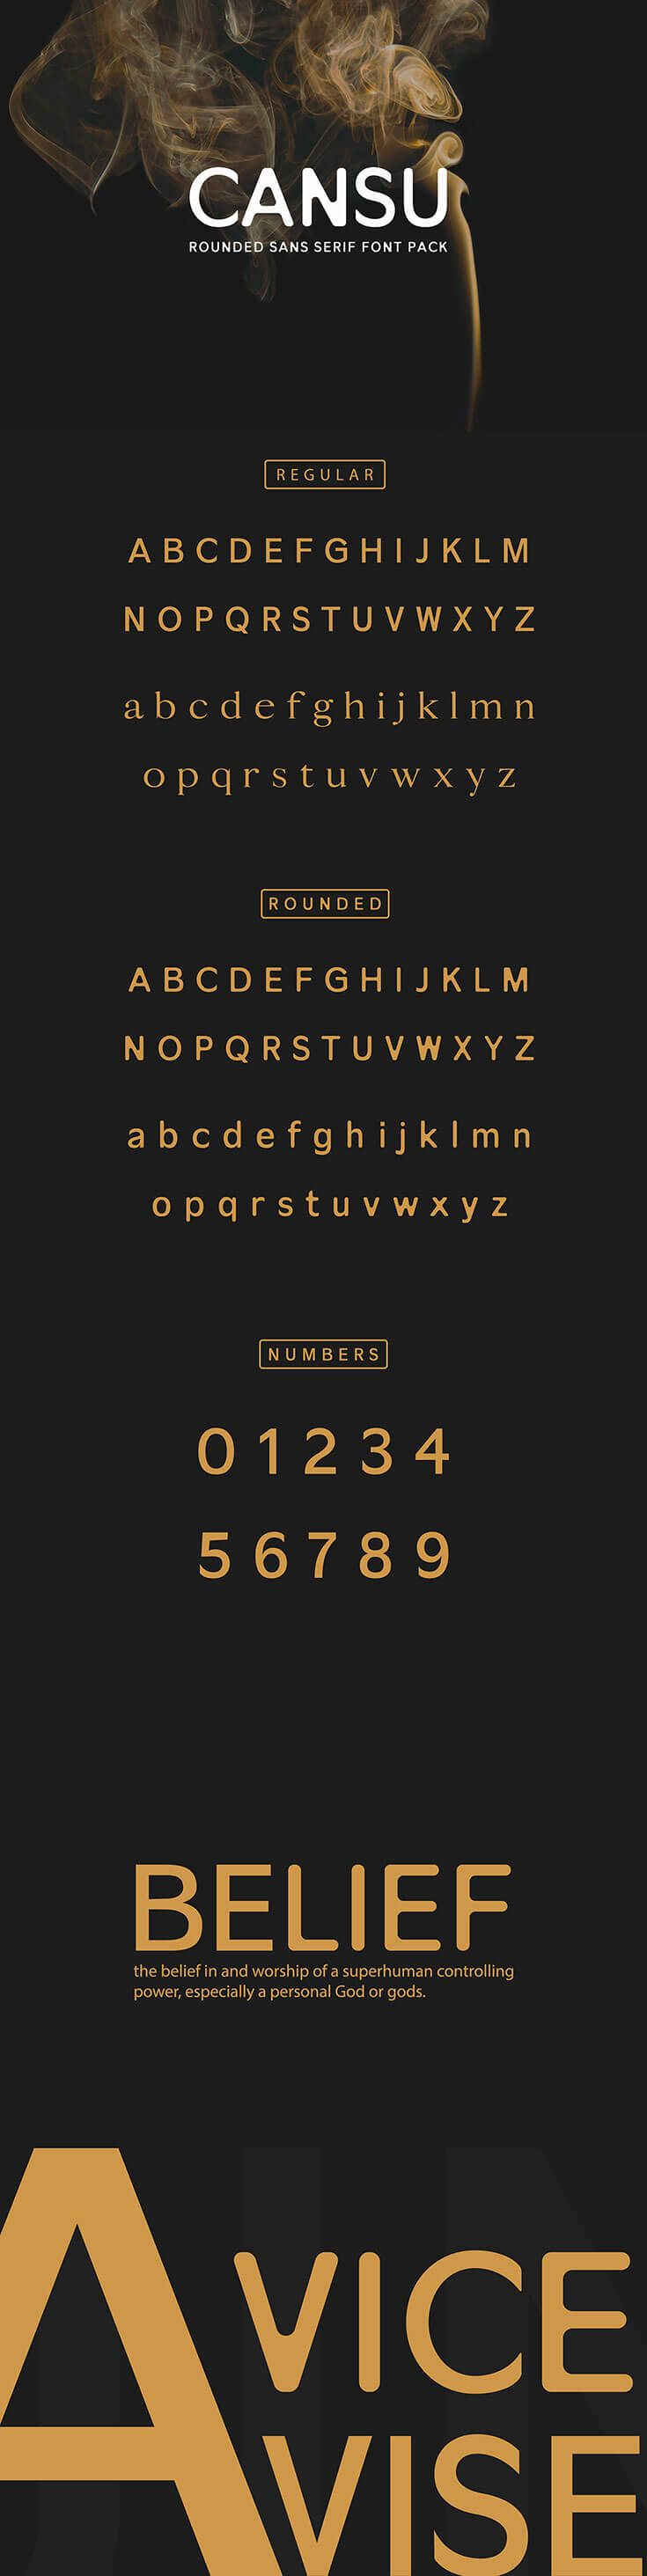 Download Free Cansu Sans Serif Font Pack | Sans serif fonts, Serif ...